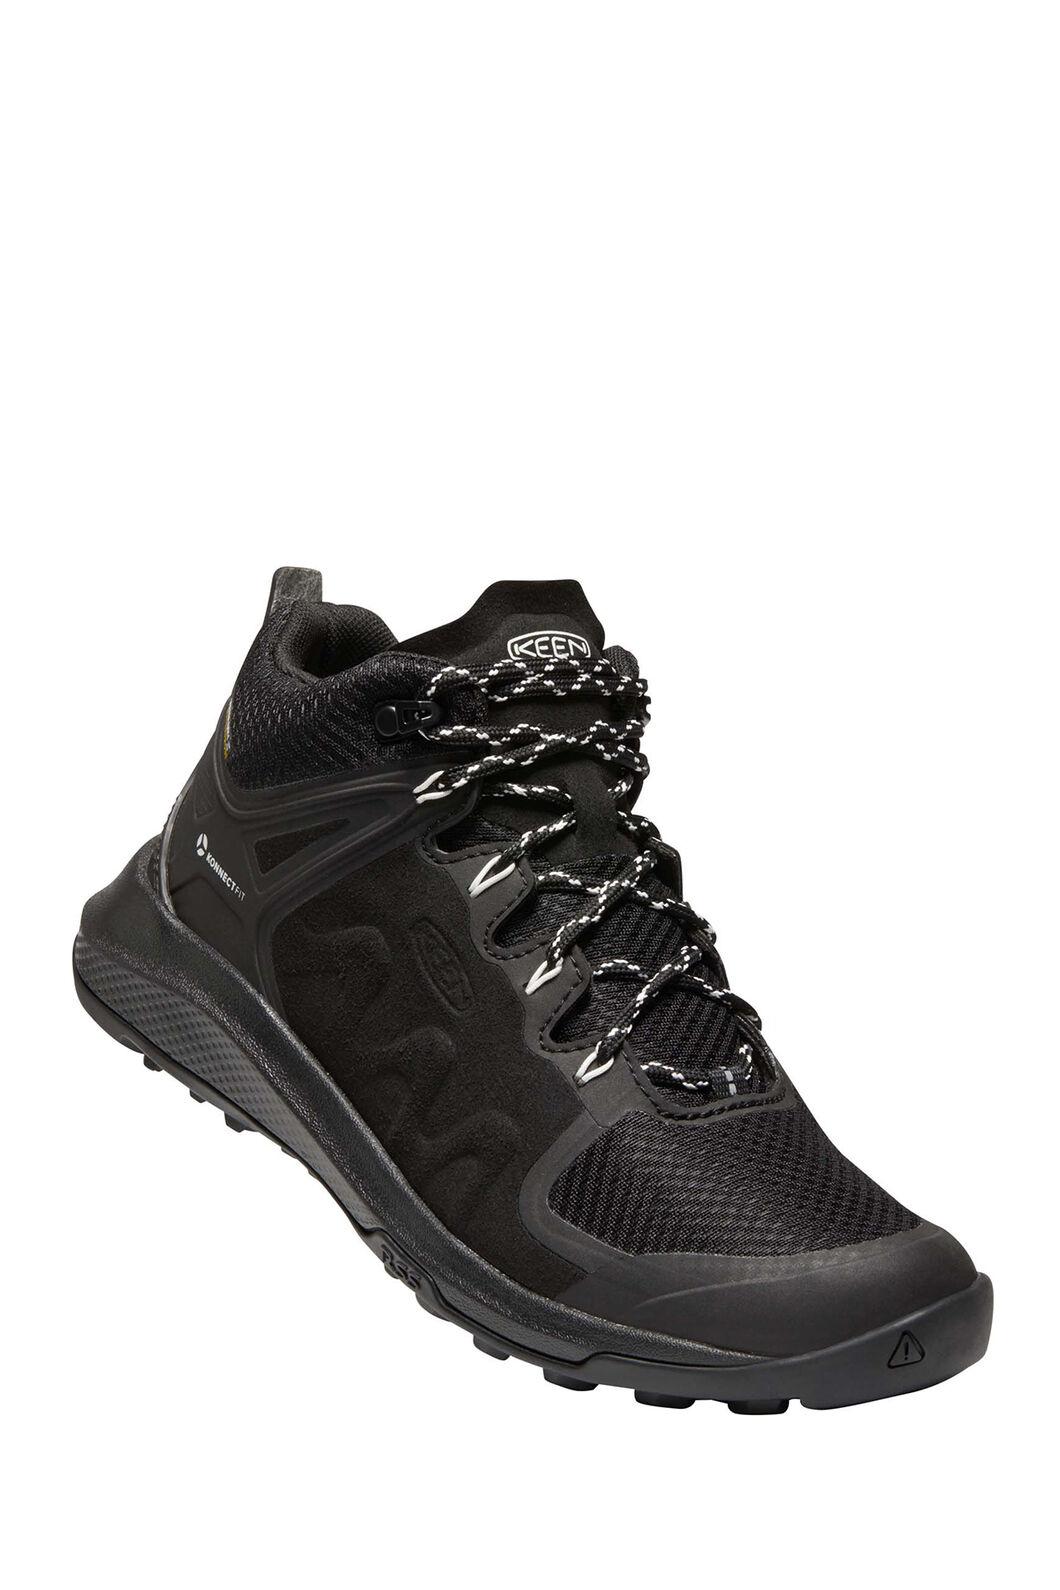 KEEN Explore WP Hiking Boots — Women's, Black/Star White, hi-res